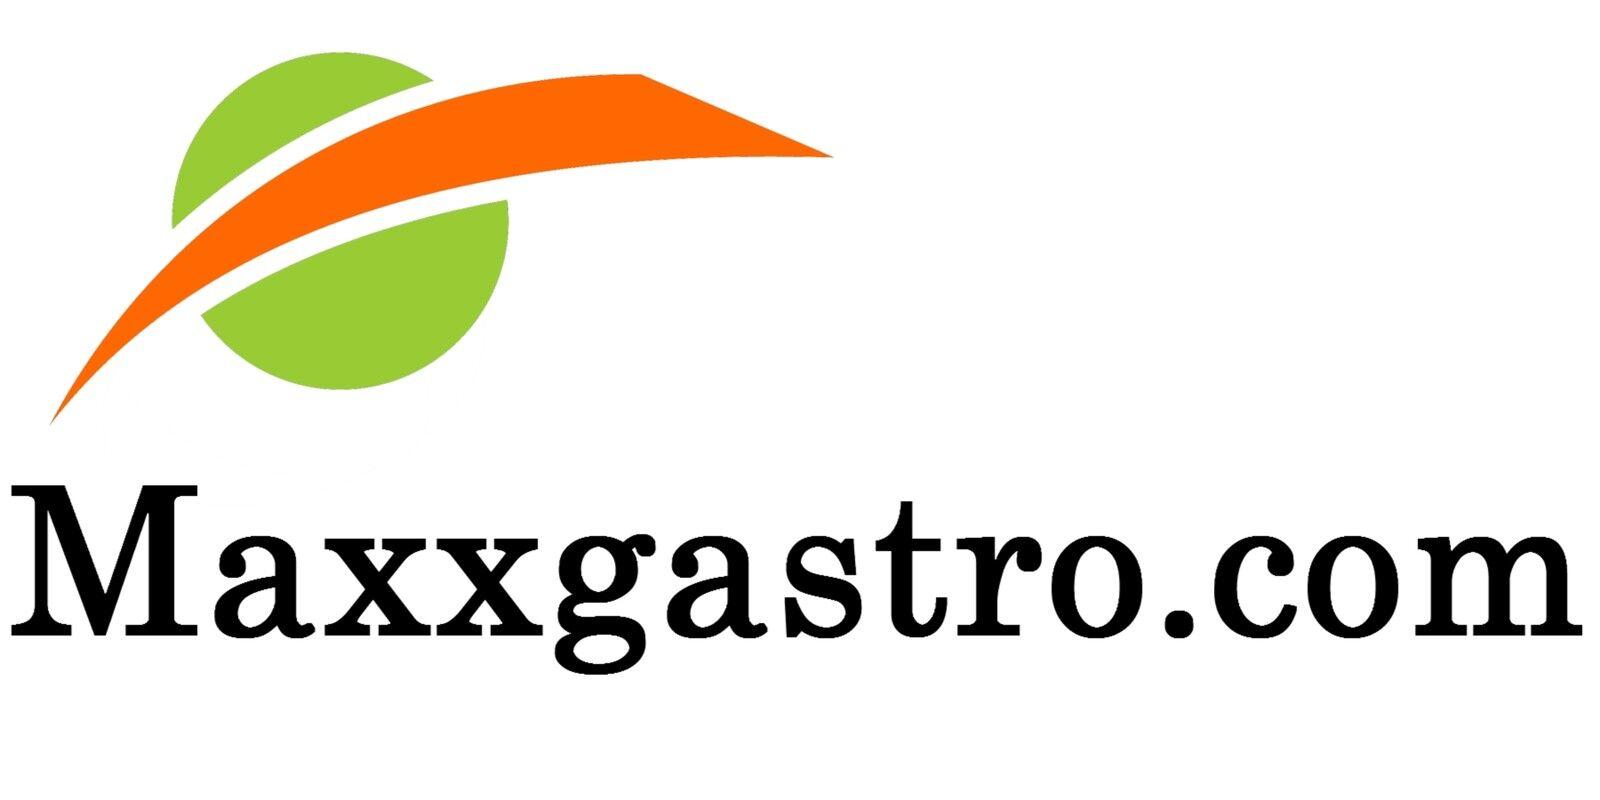 Maxxgastro.com